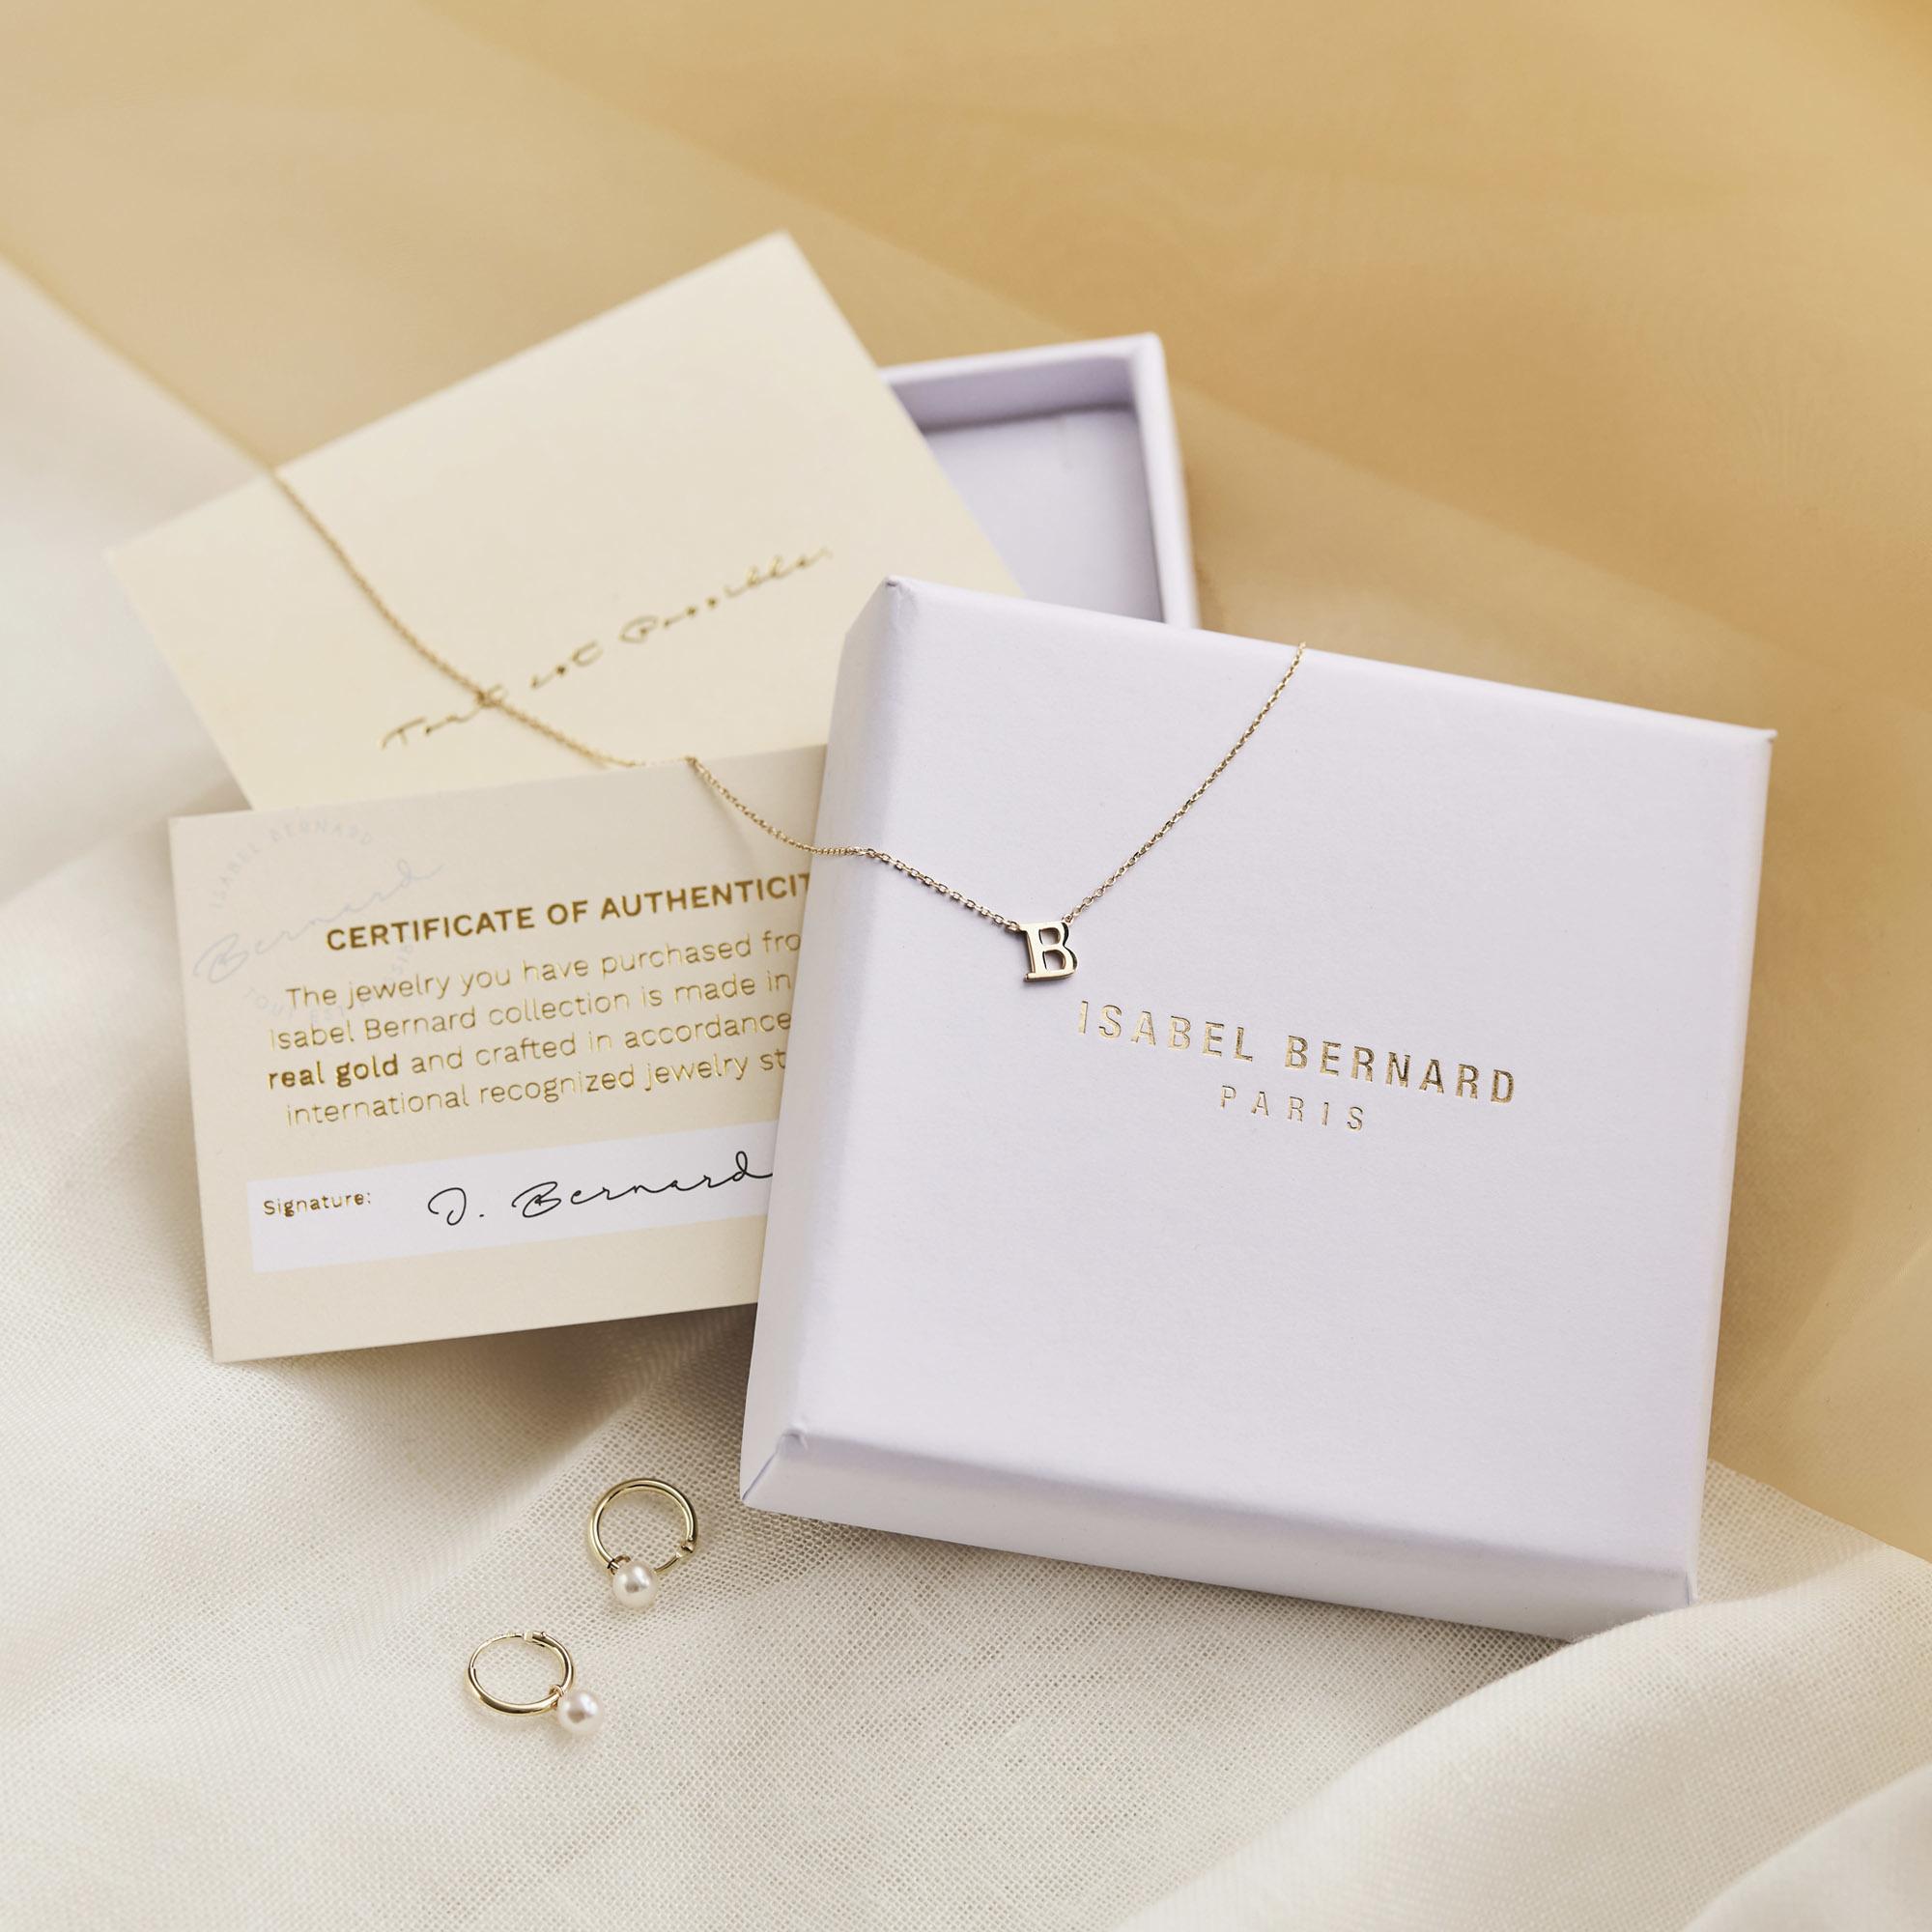 Isabel Bernard Belleville Amore 14 karat gold collier with heart